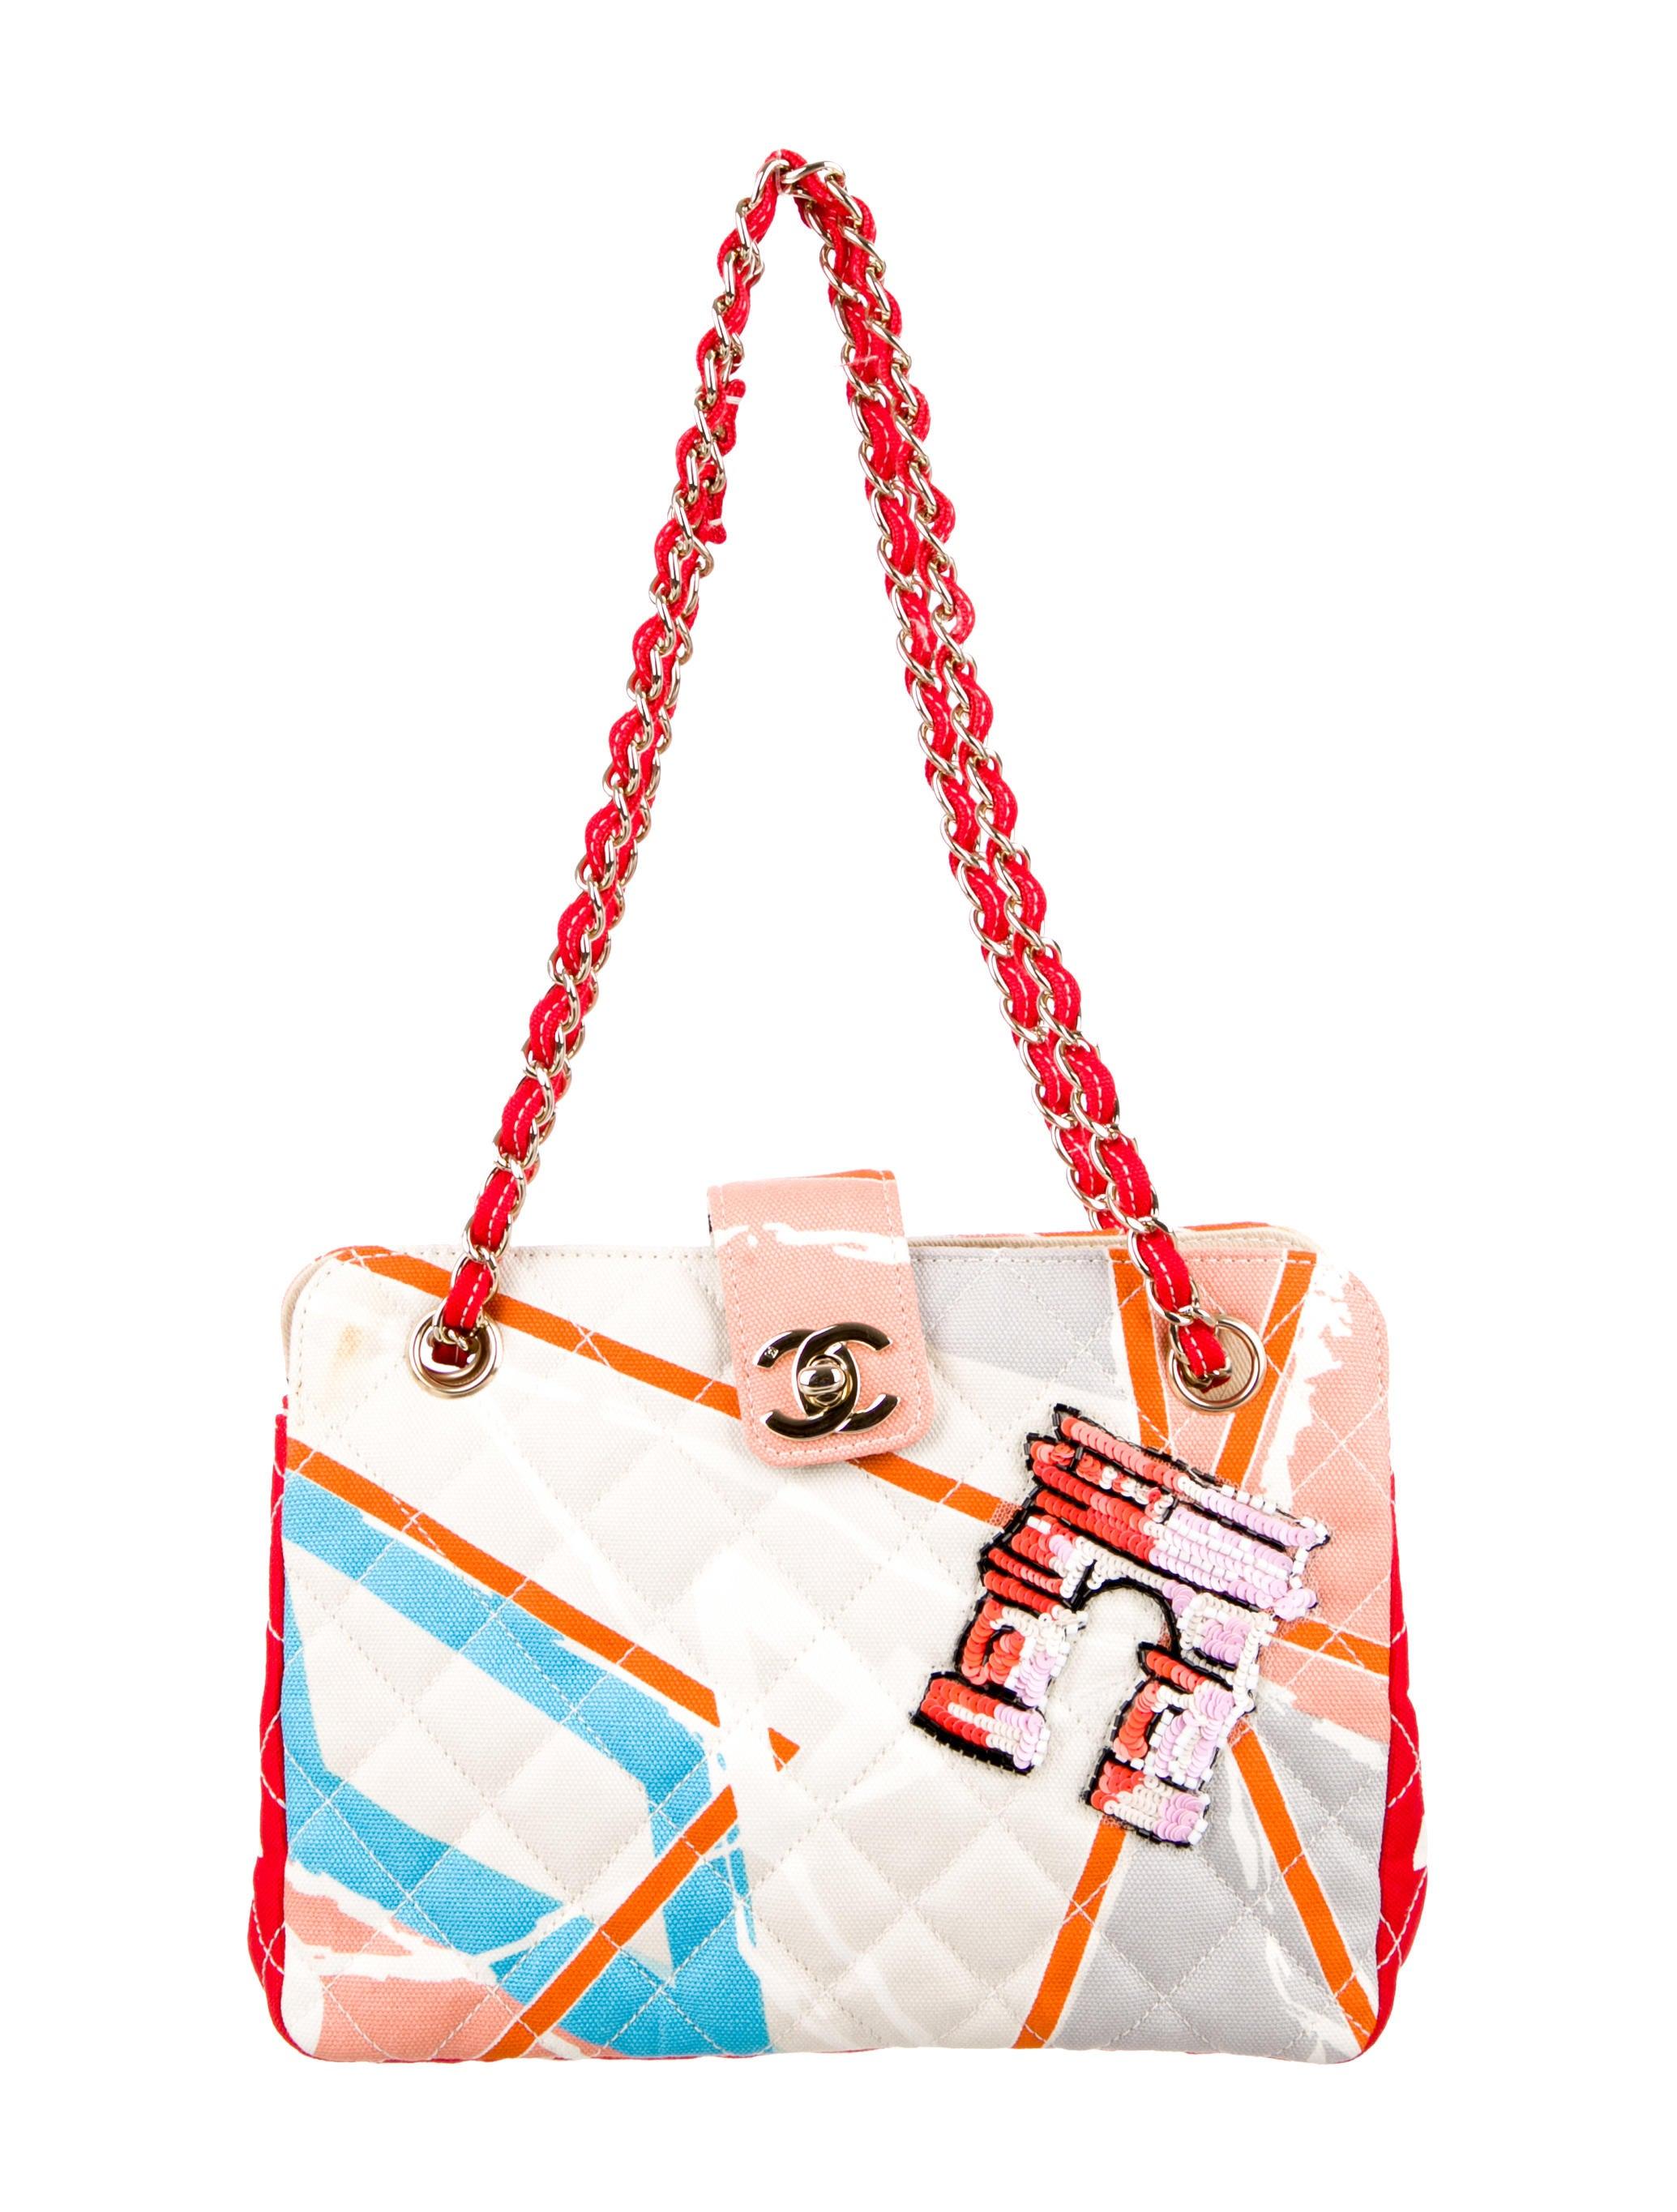 058712e4247328 Chanel Quilted Arc de Triomphe Bag - Handbags - CHA100816 | The RealReal